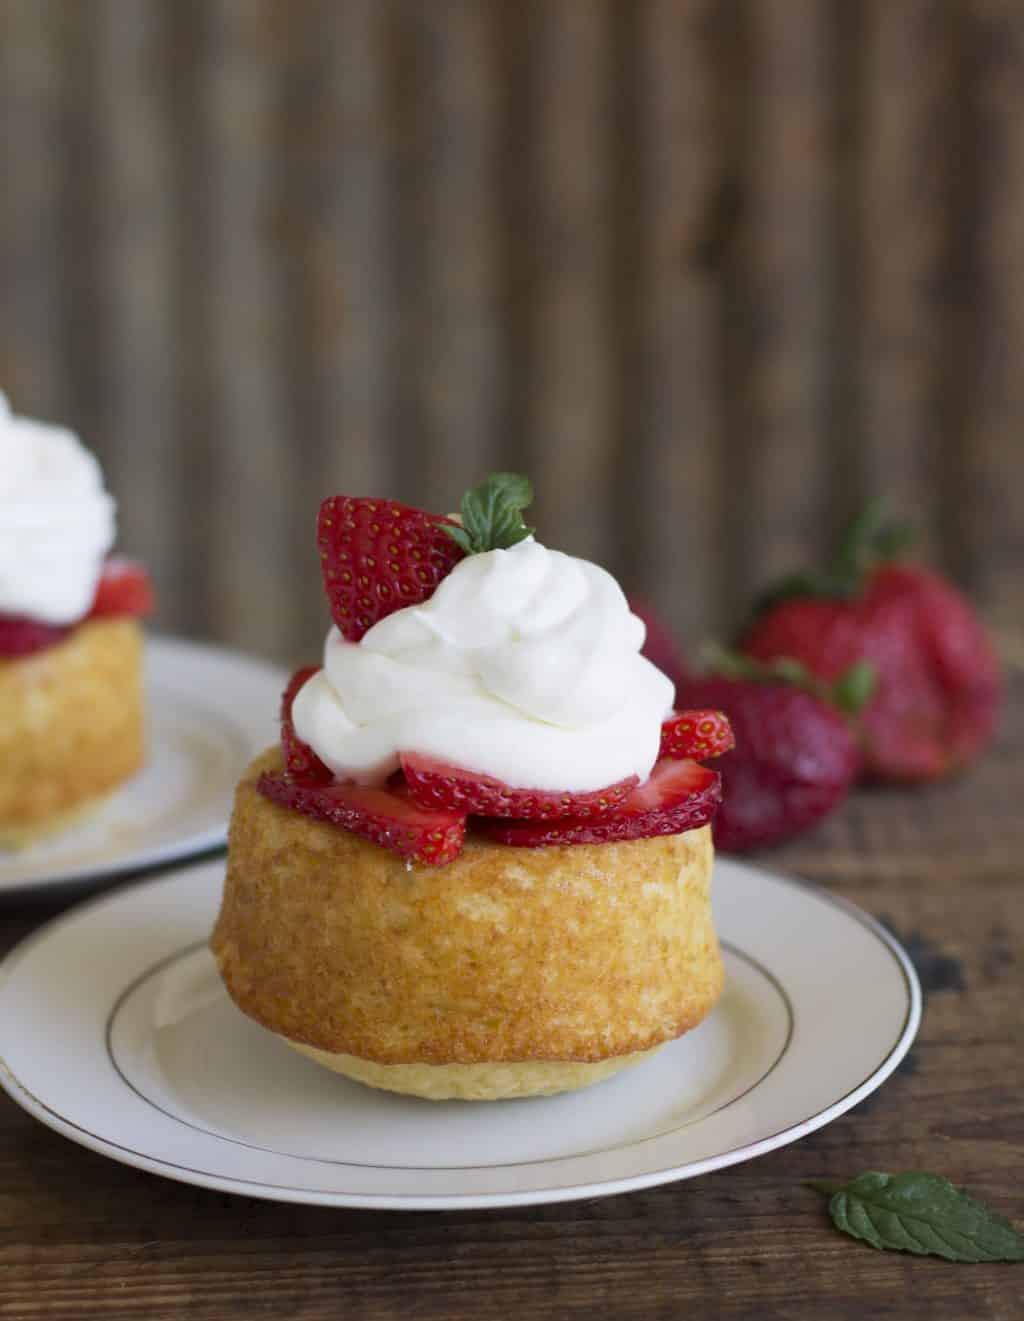 Easy Strawberry Shortcake Recipe  Homemade Strawberry Shortcake